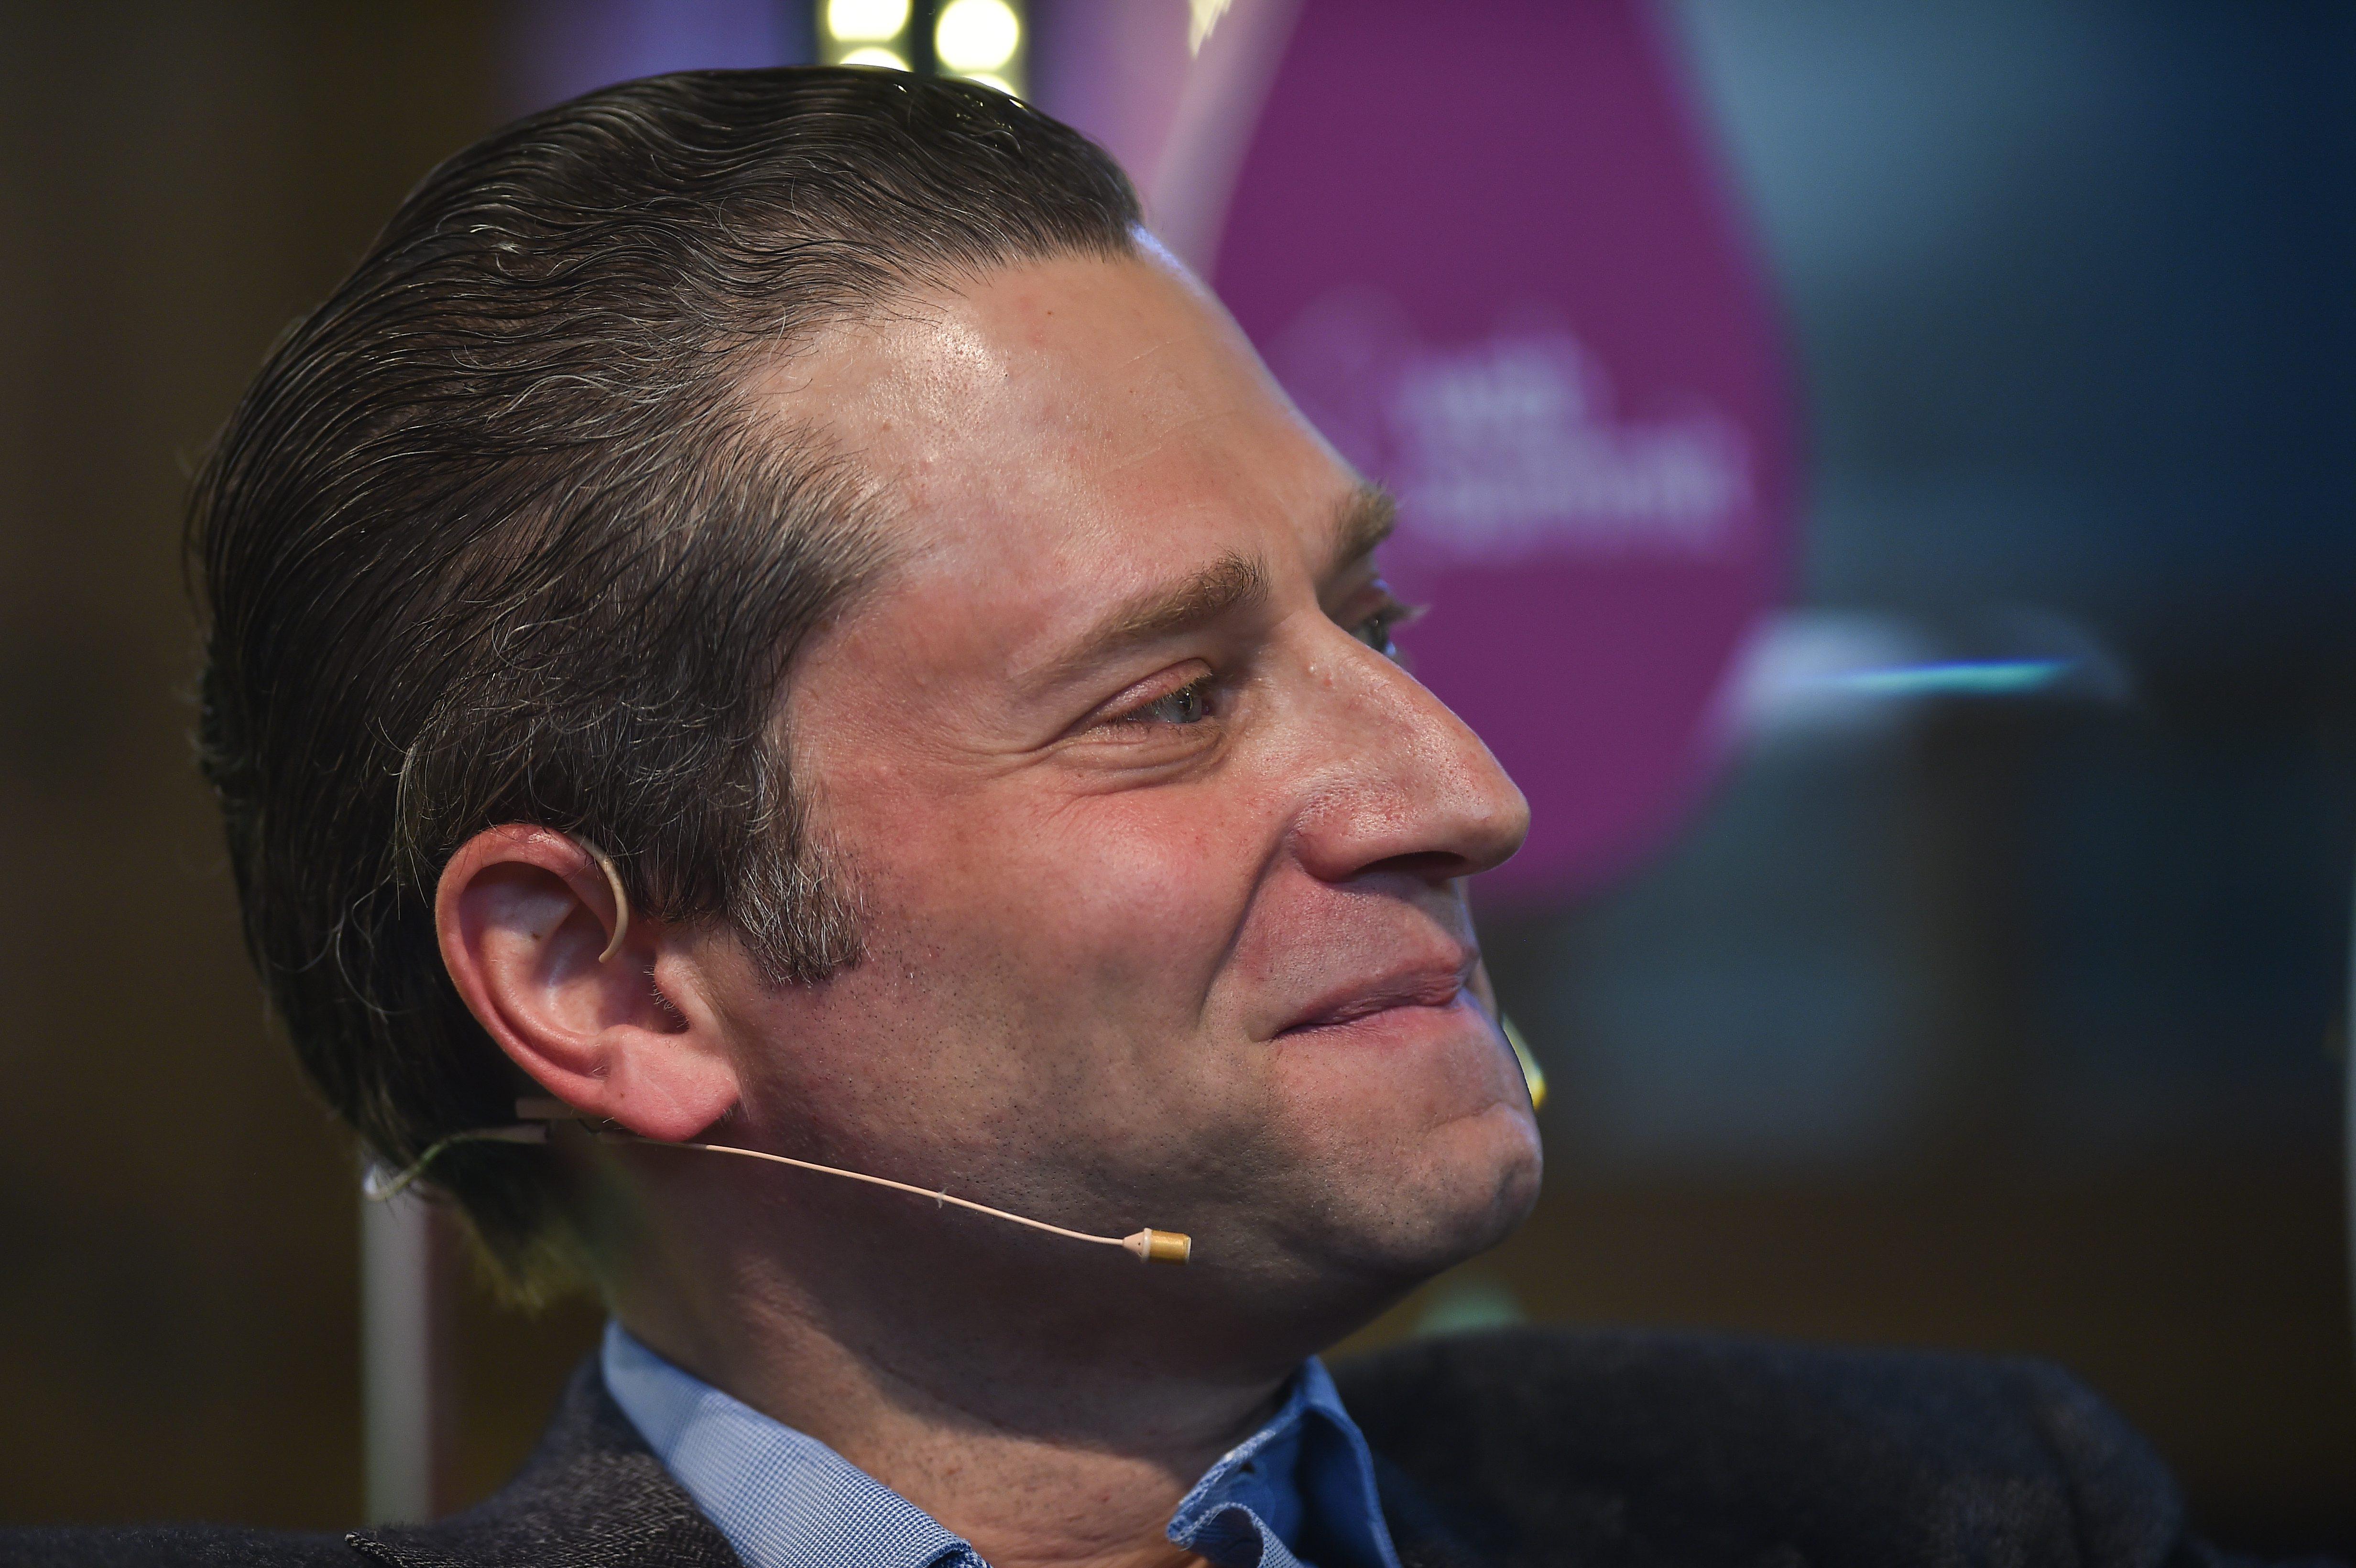 Schaap at [[Web Summit]] in 2014